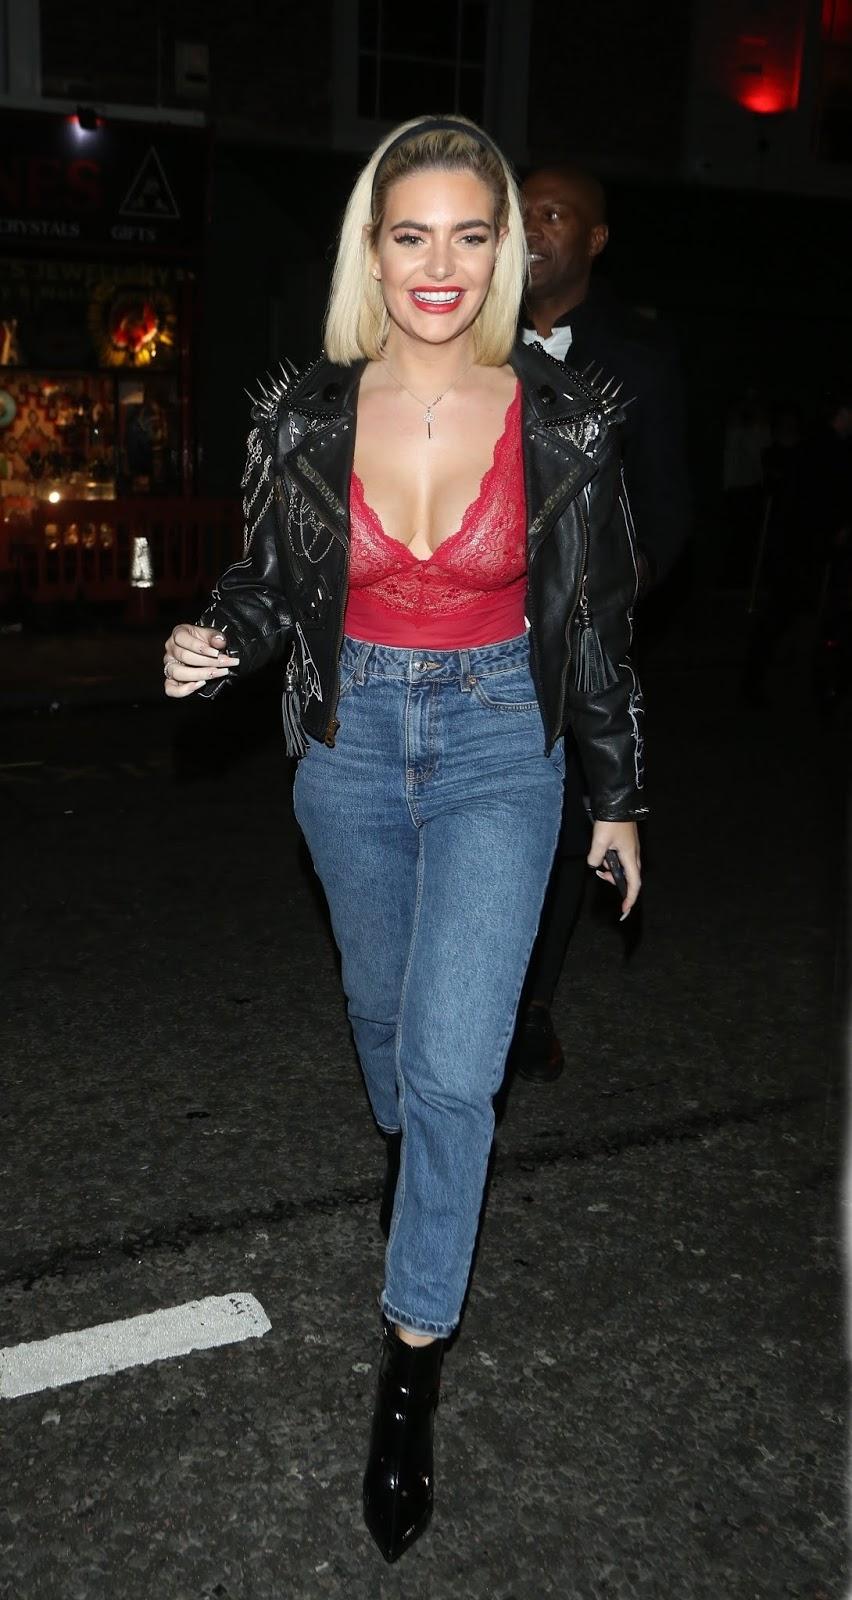 Megan Barton Hanson seen leaving Raffles nightclu in London - 02/08/2019